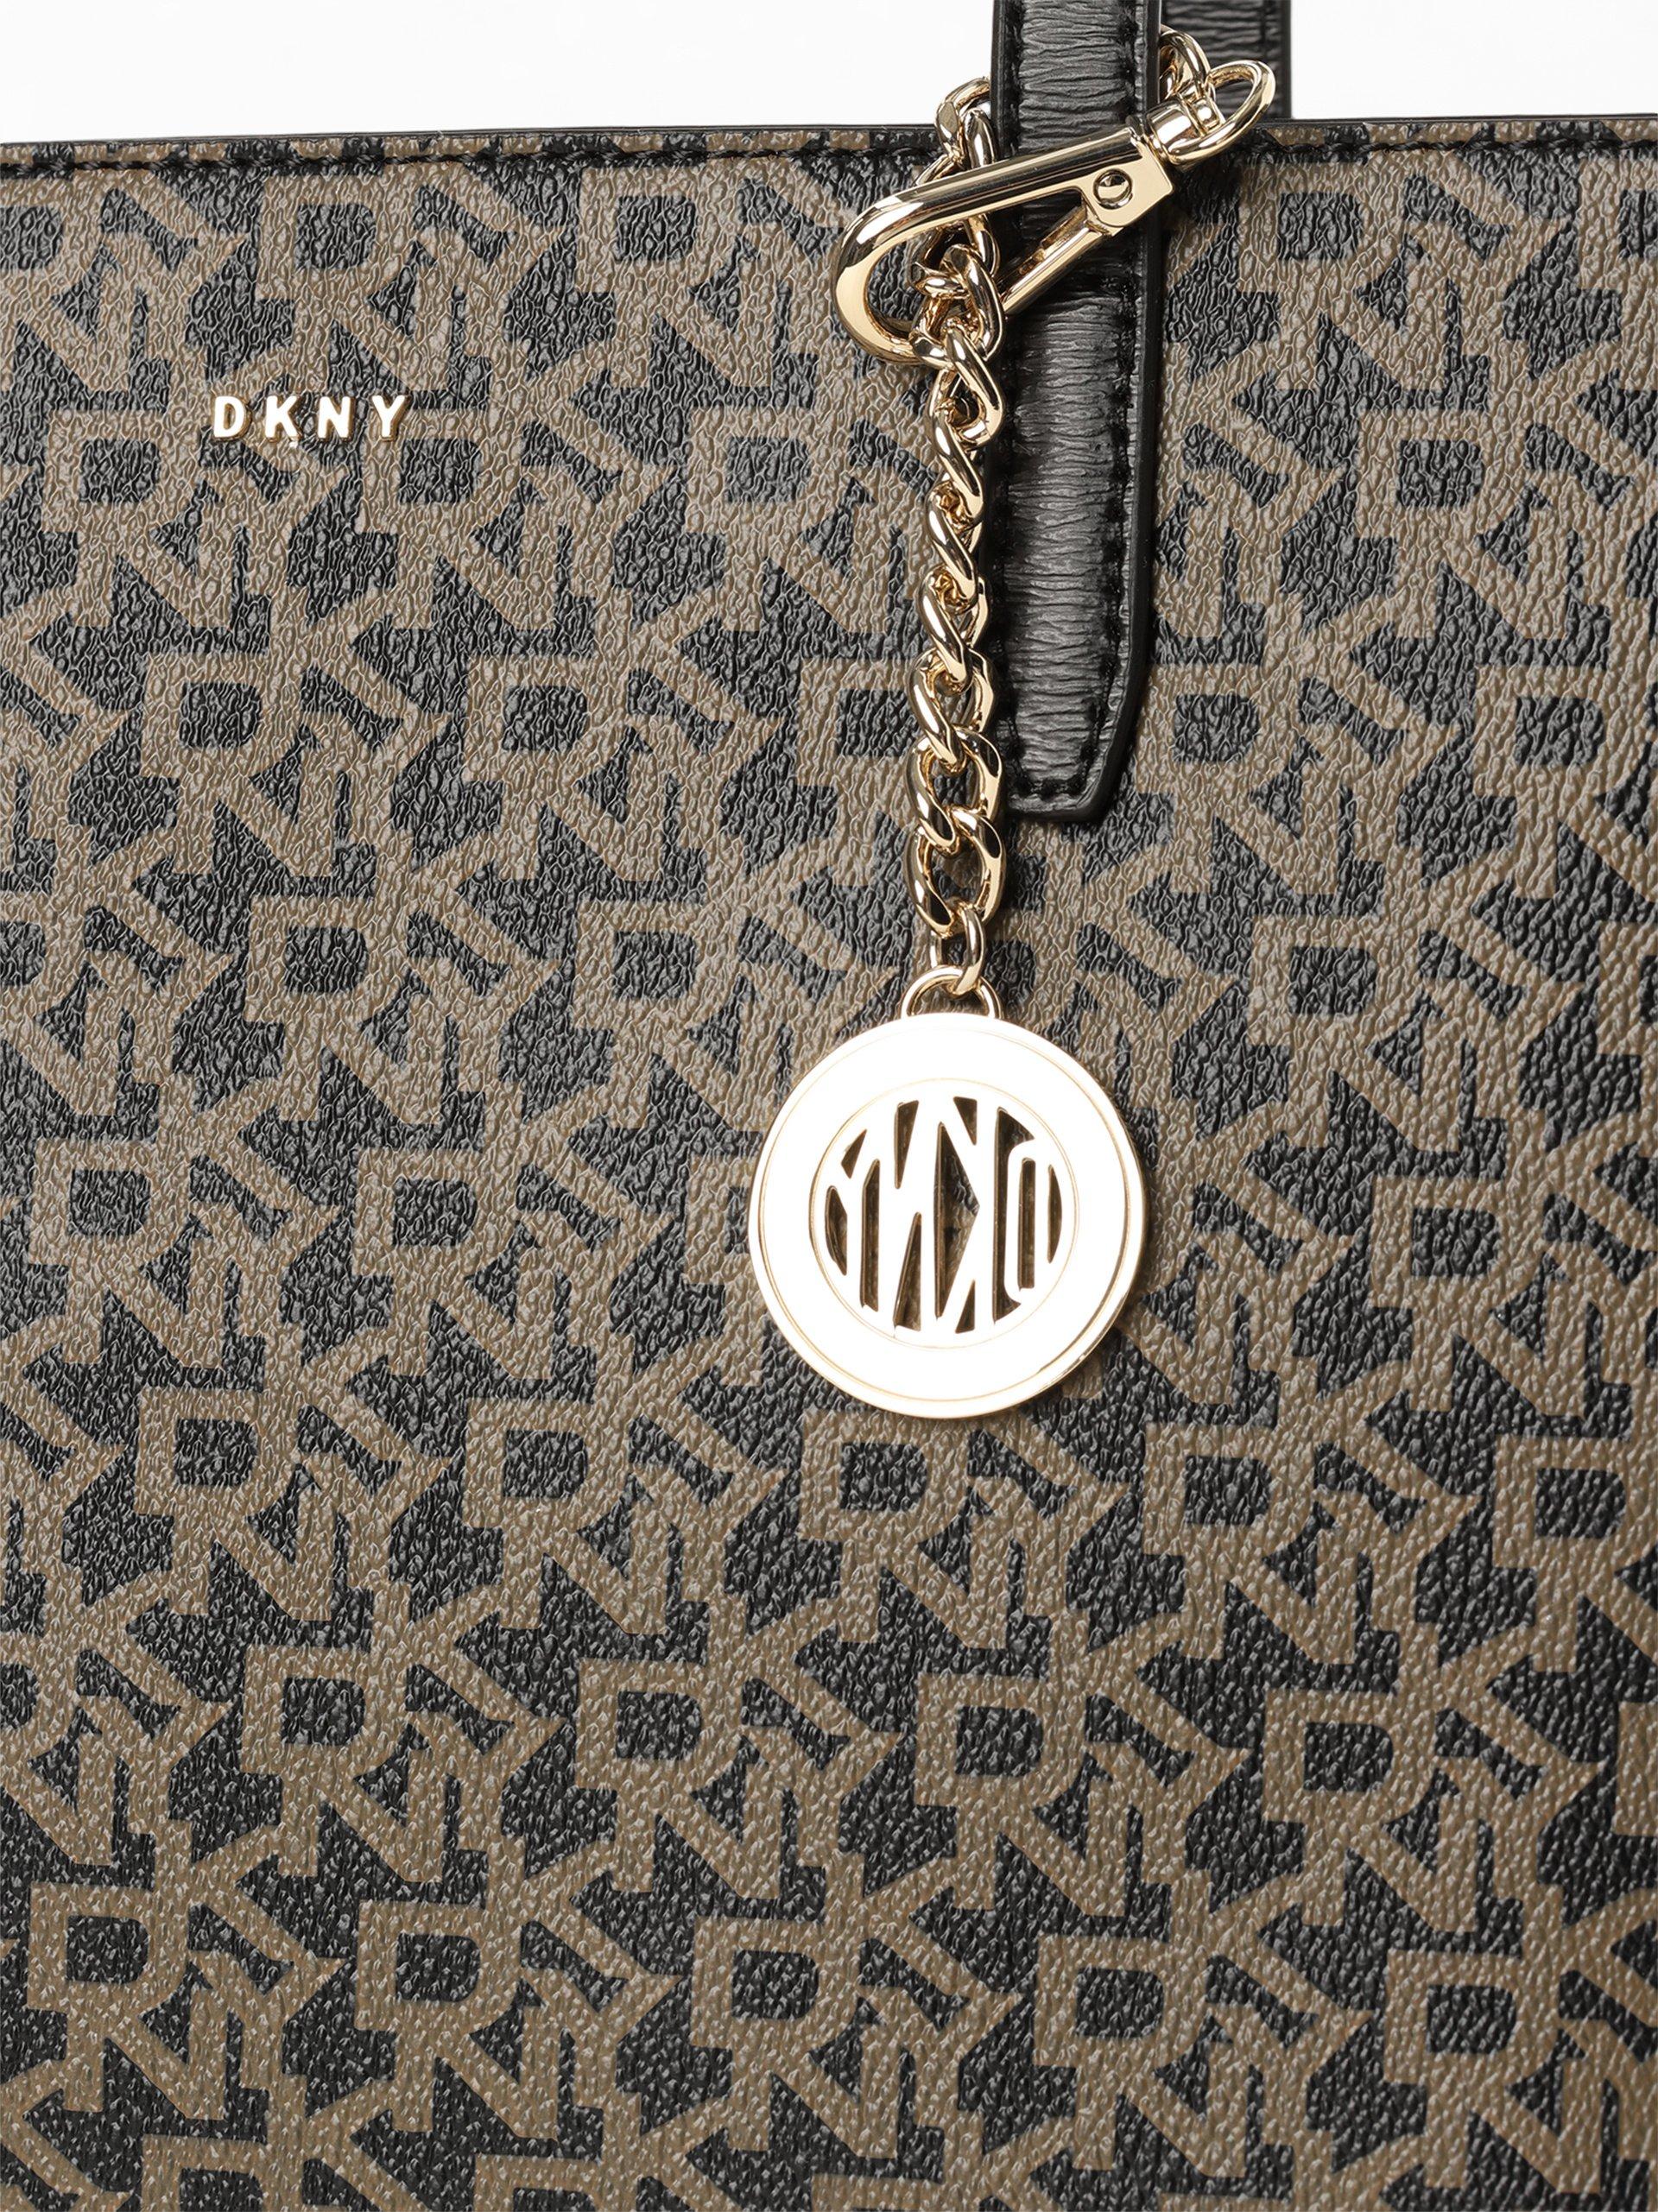 DKNY Damen Shopper mit Leder-Anteil - Bryant